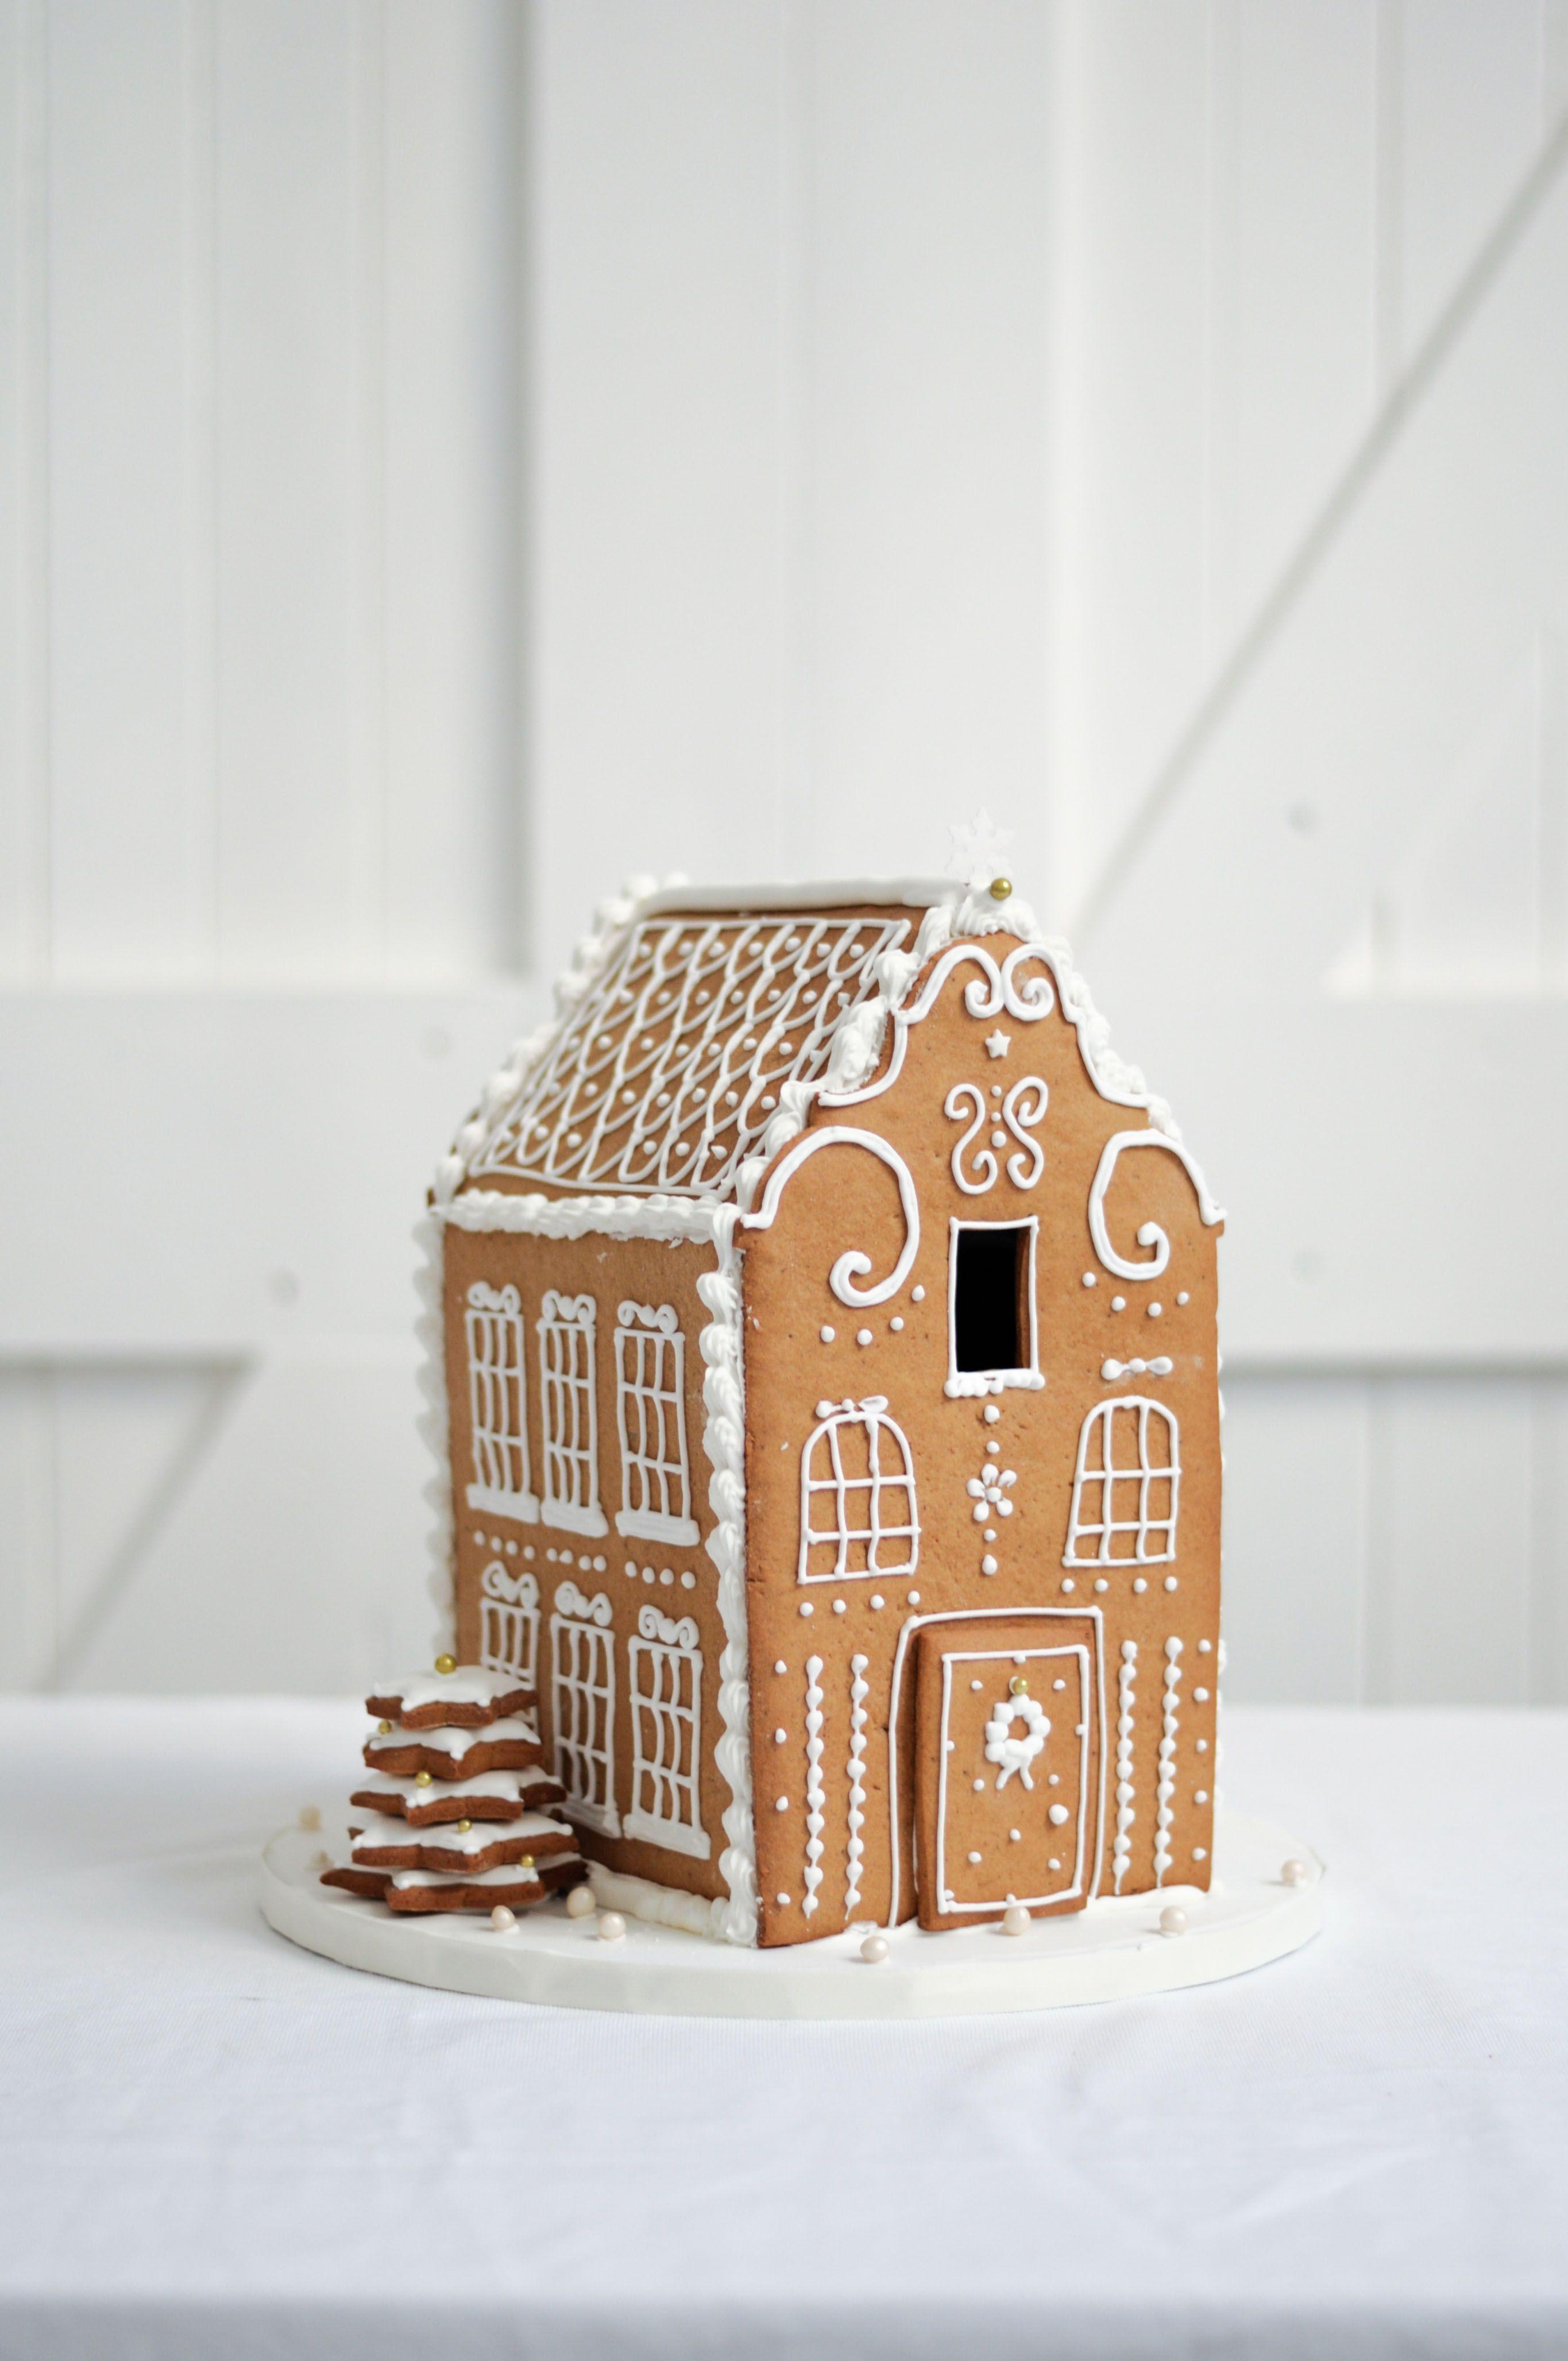 Old Cape Dutch Gingerbread House By Lionheart Rozhdestvenskij Imbirnyj Pryanik Pryanik